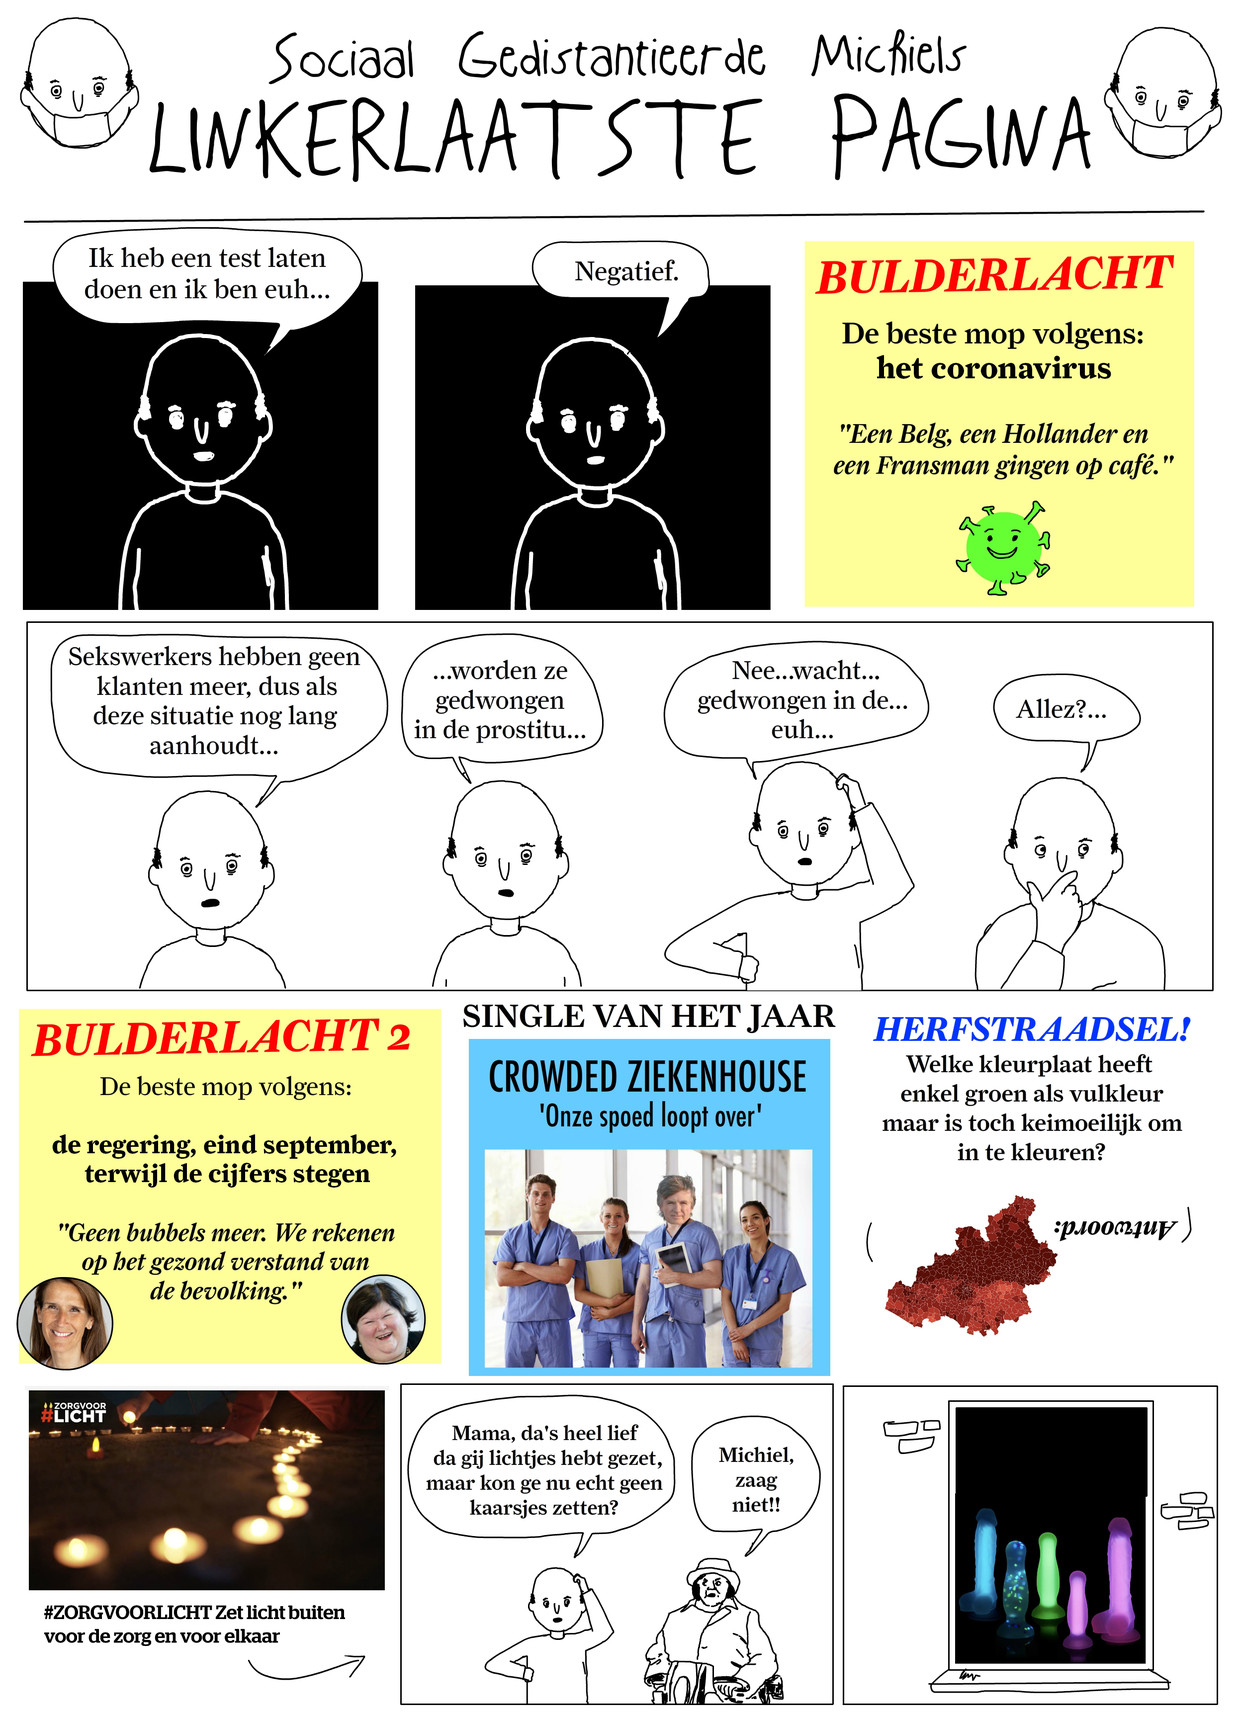 Sociaal incapabele michiel - week 45 Beeld Tom Borremans | Humo